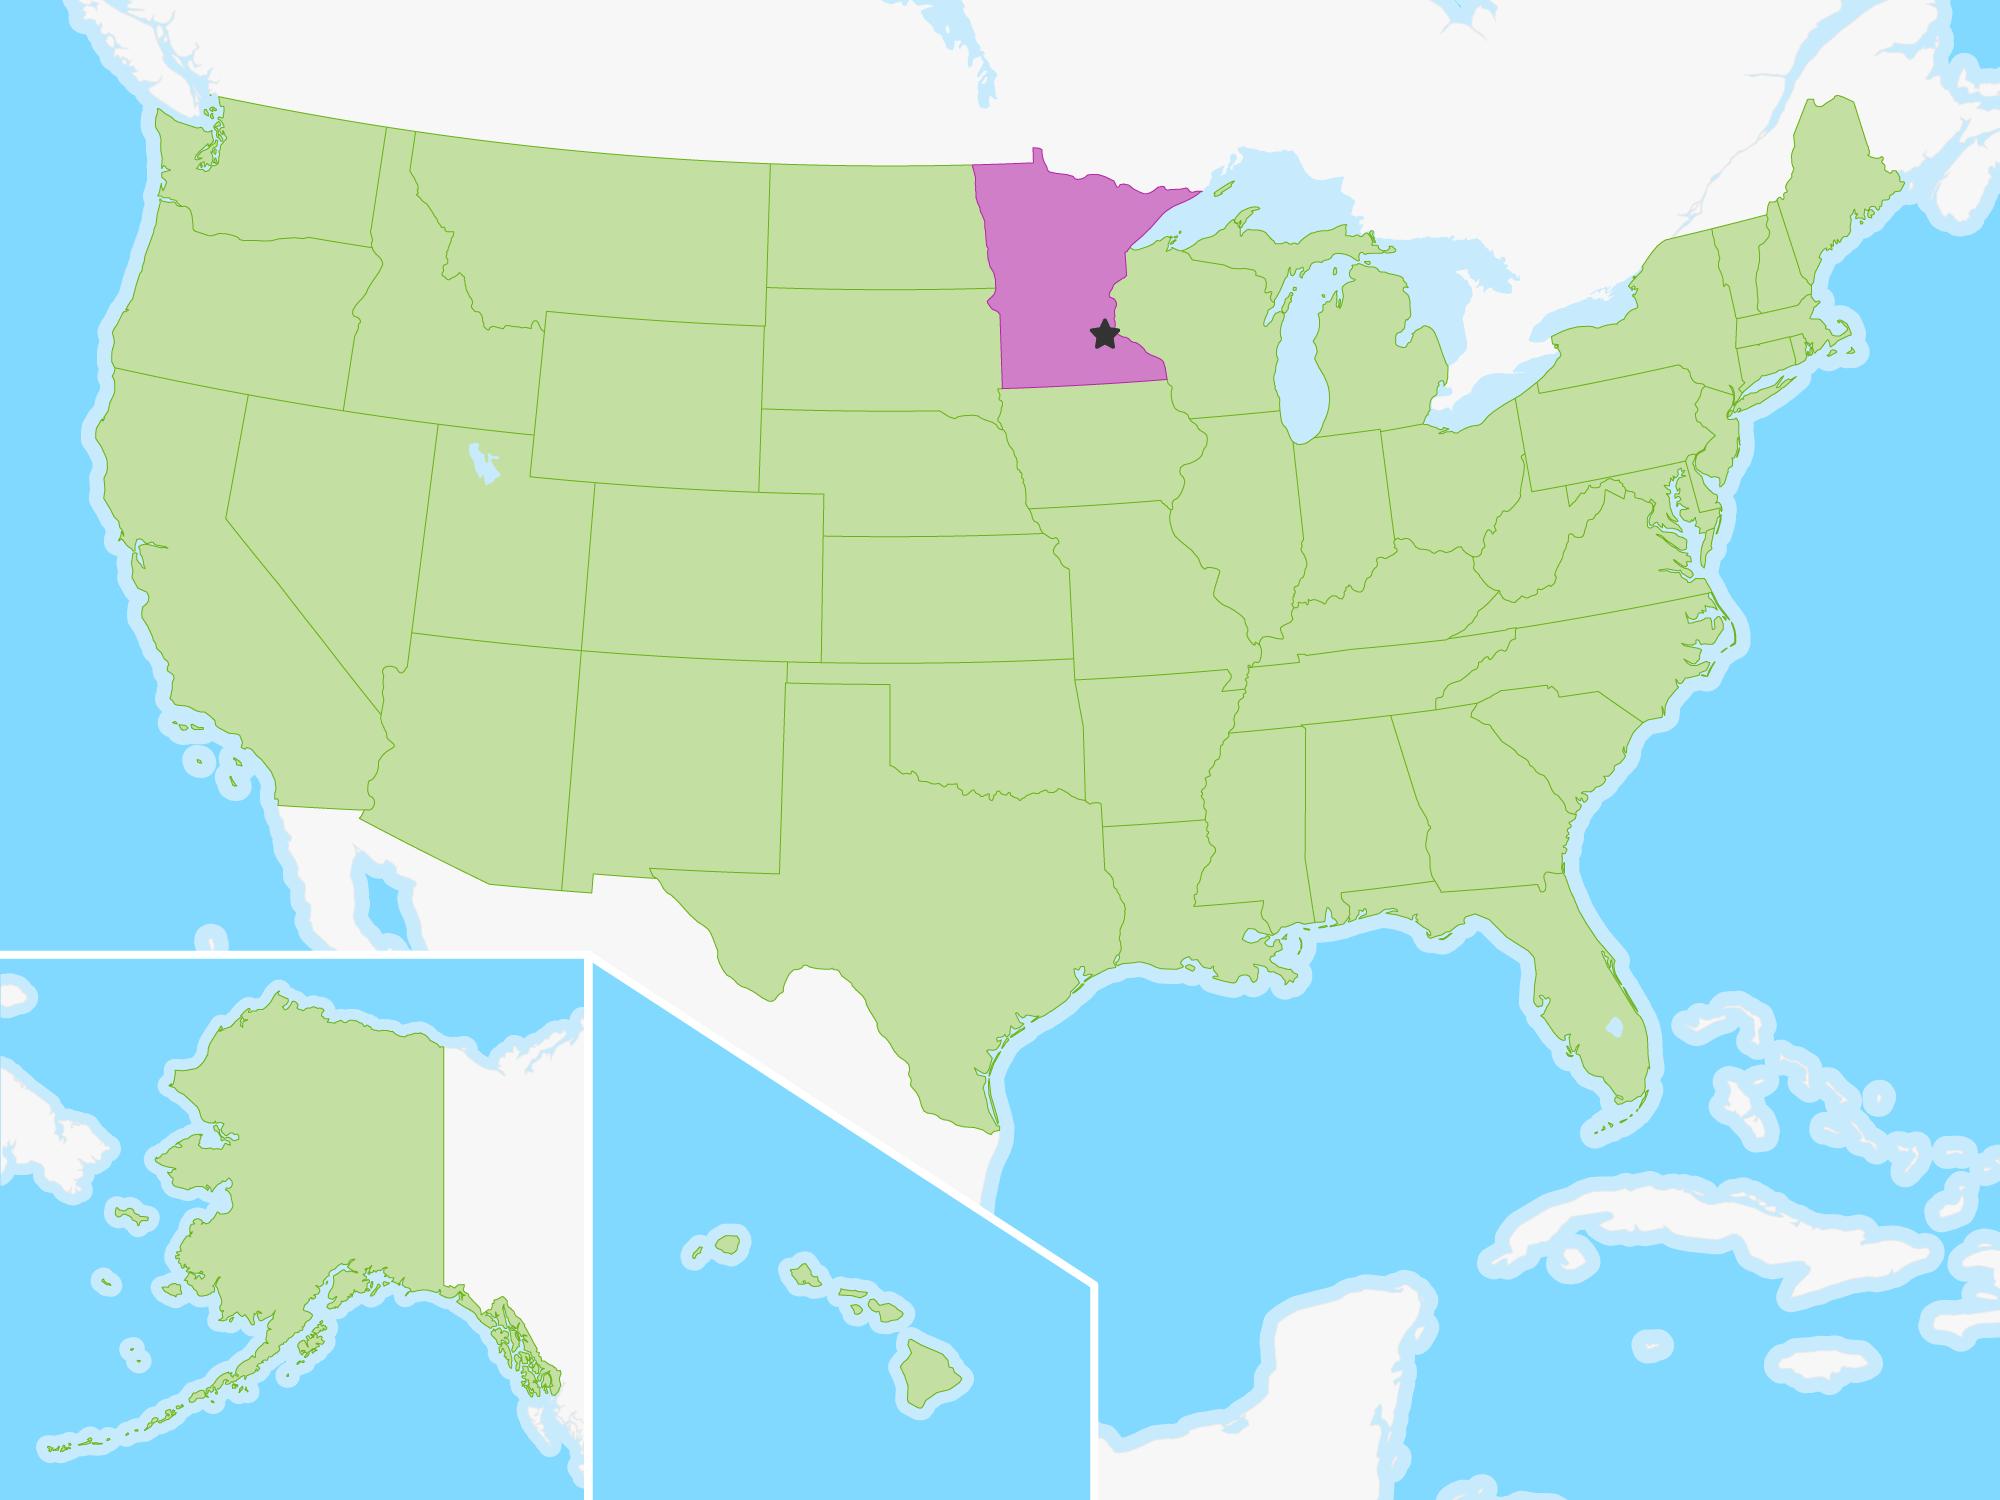 Minnesota | Free Study Maps on us map north dakota, us map wisconsin, atlas map of minnesota, us map michigan, state map of minnesota, us map illinois, us map south dakota, show map of minnesota,